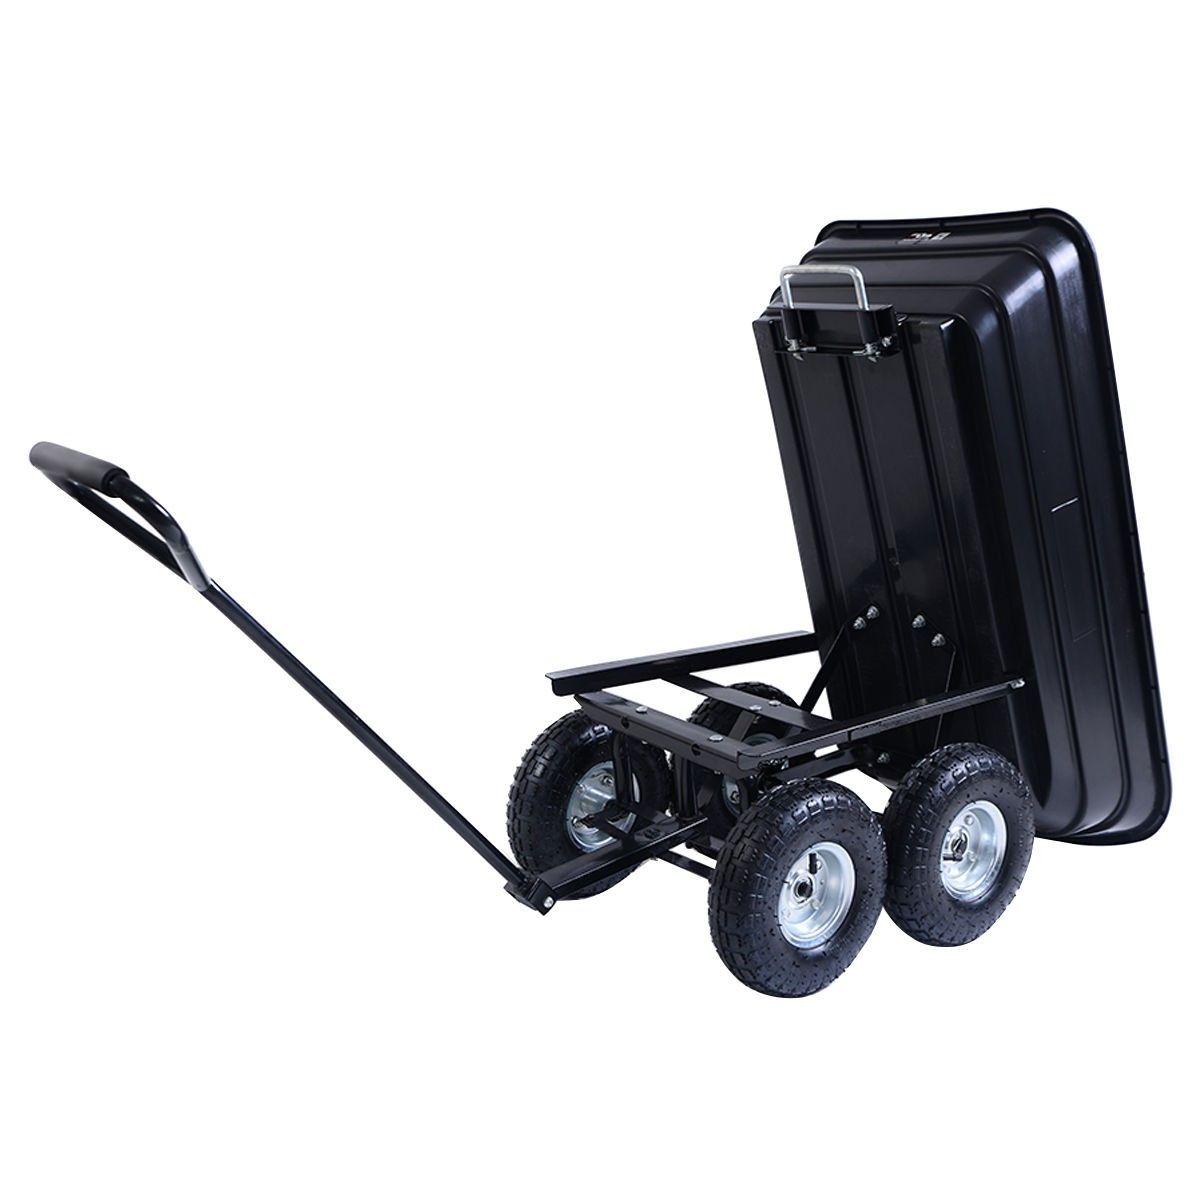 650Lbs Garden Dump Cart Dumper Wagon Carrier Wheel Barrow Air Tires Heavy Duty